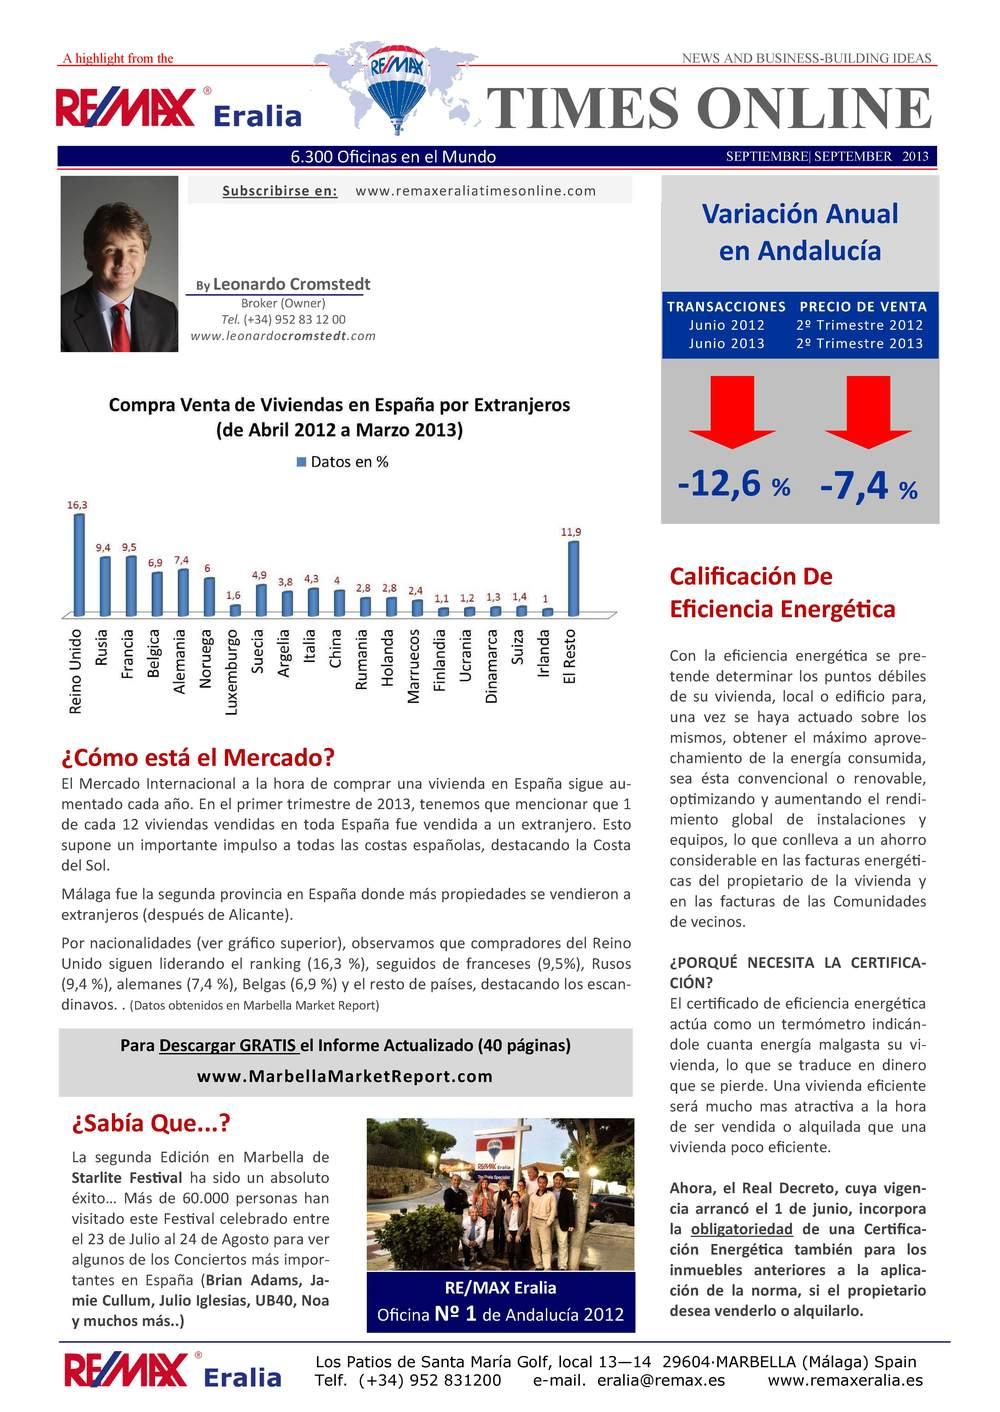 REMAX Eralia Times Online (Septiembre 2013) ESP.jpg